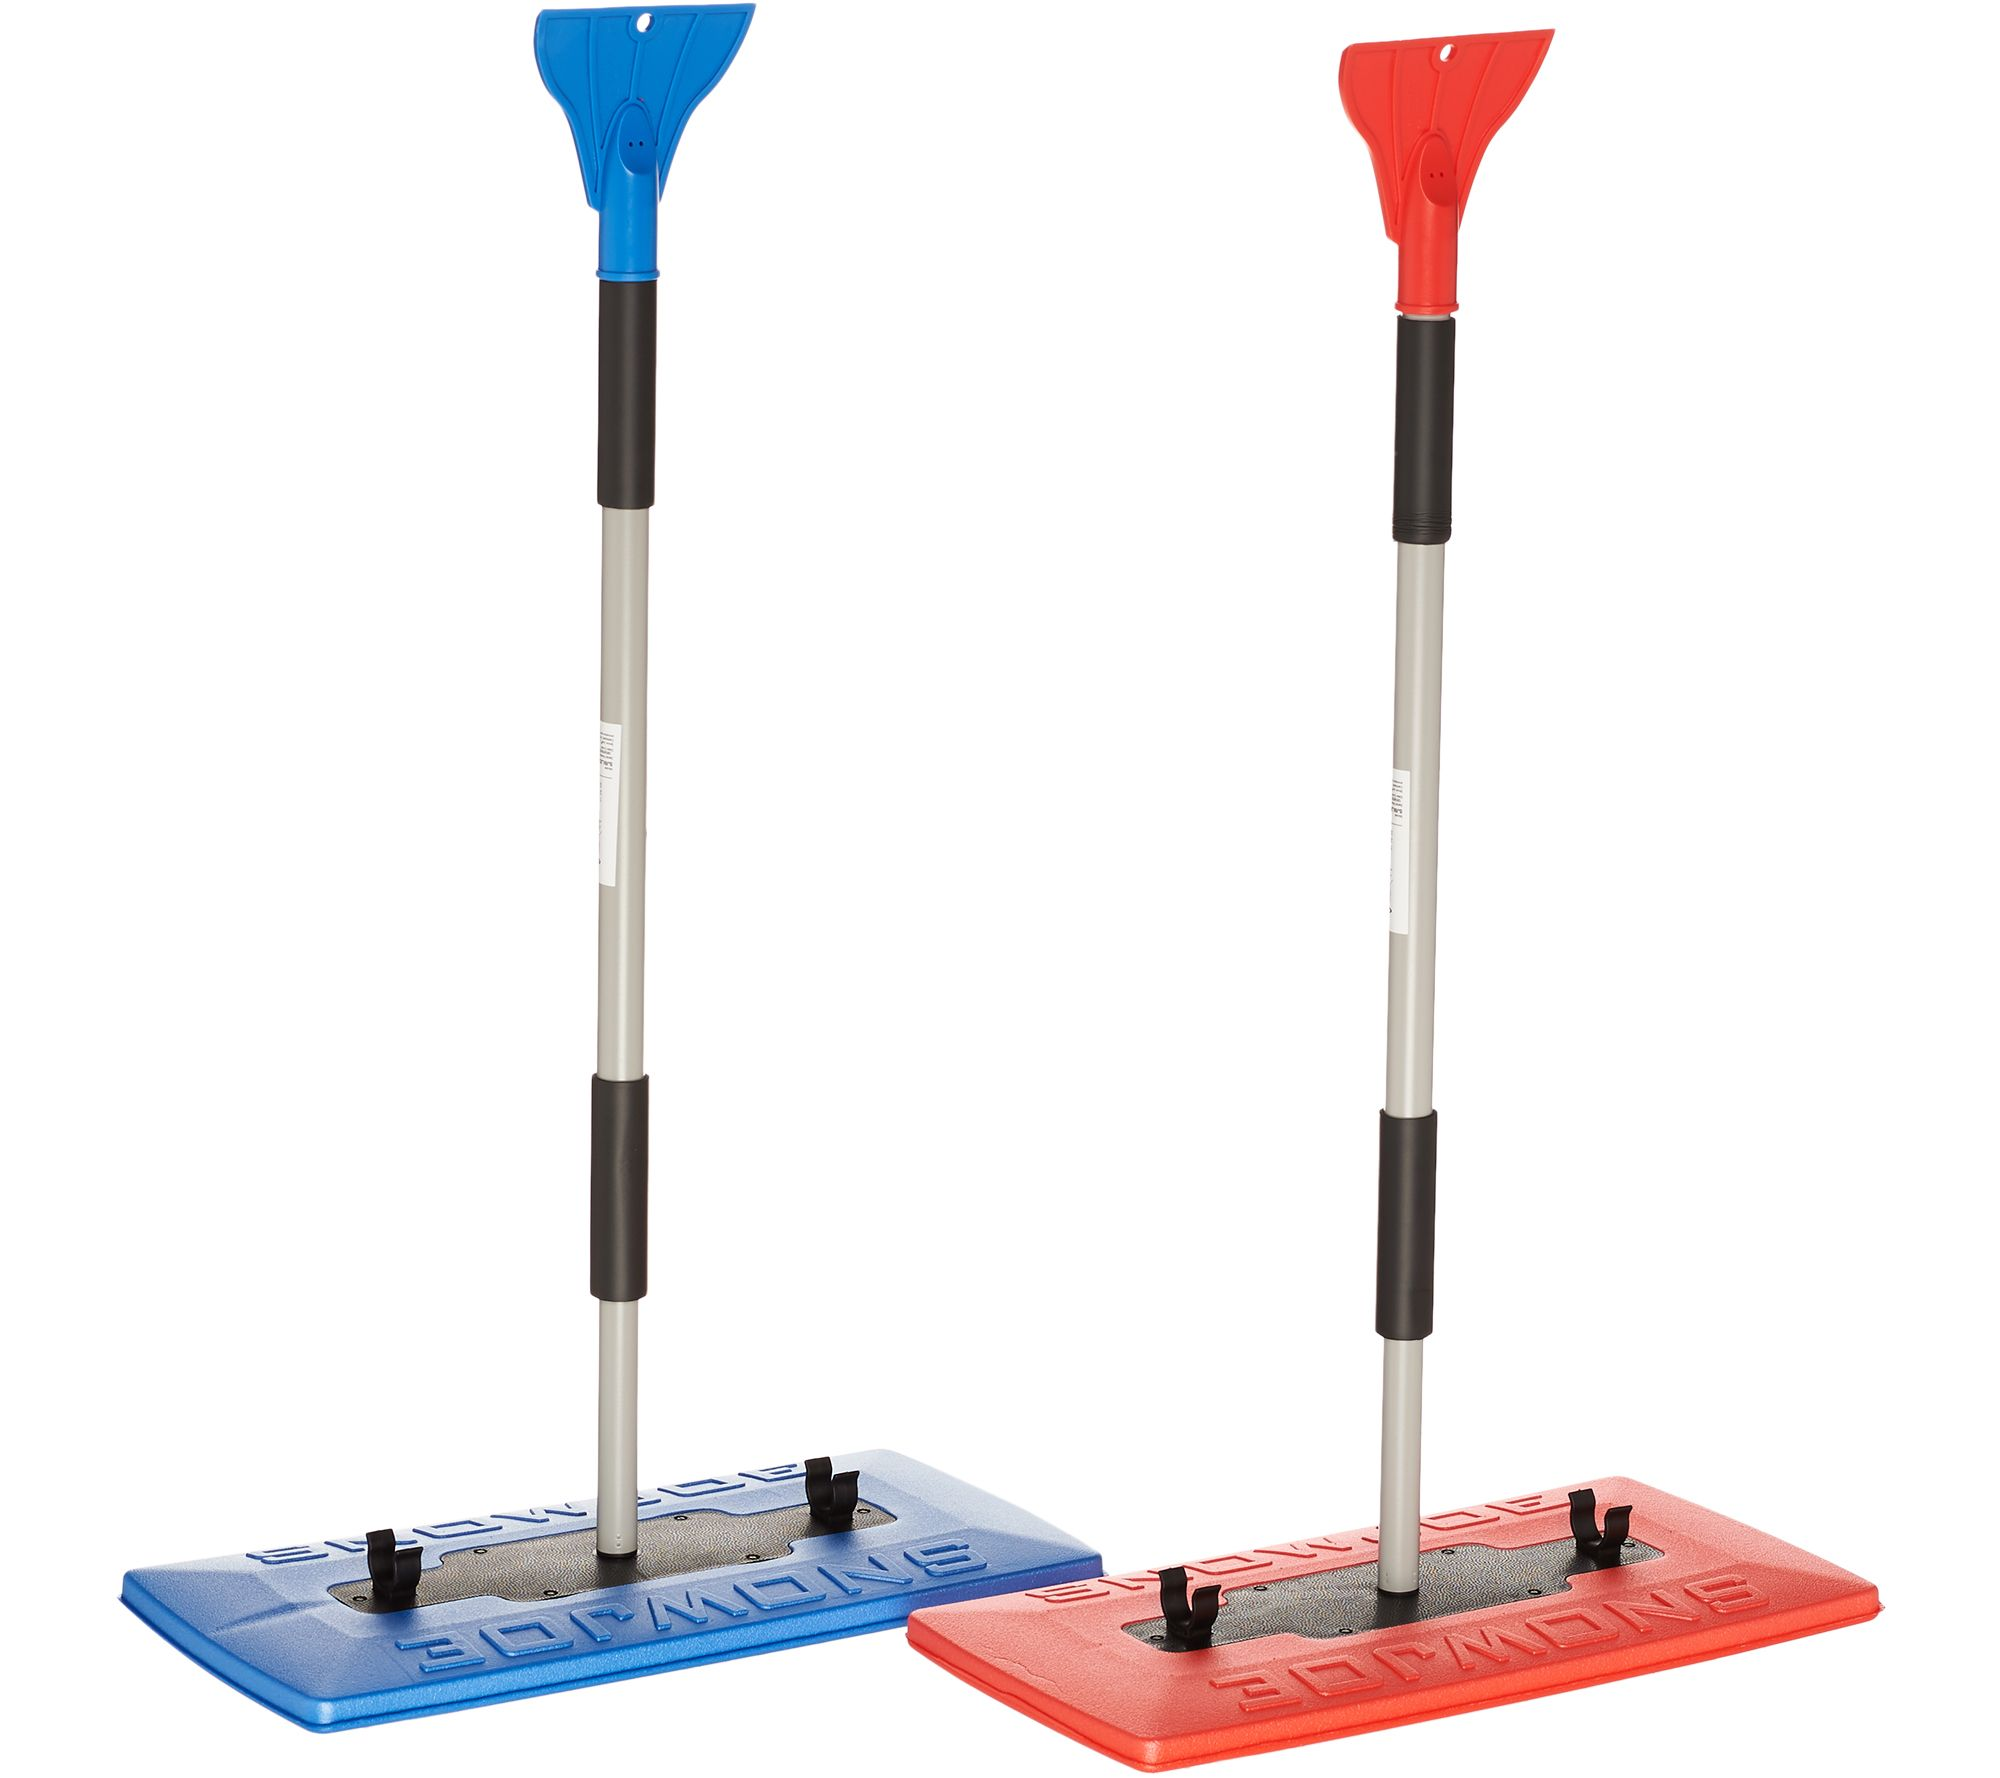 Snow Joe Set of 2 Oversized Snow Brooms w/ Ice Scrapers